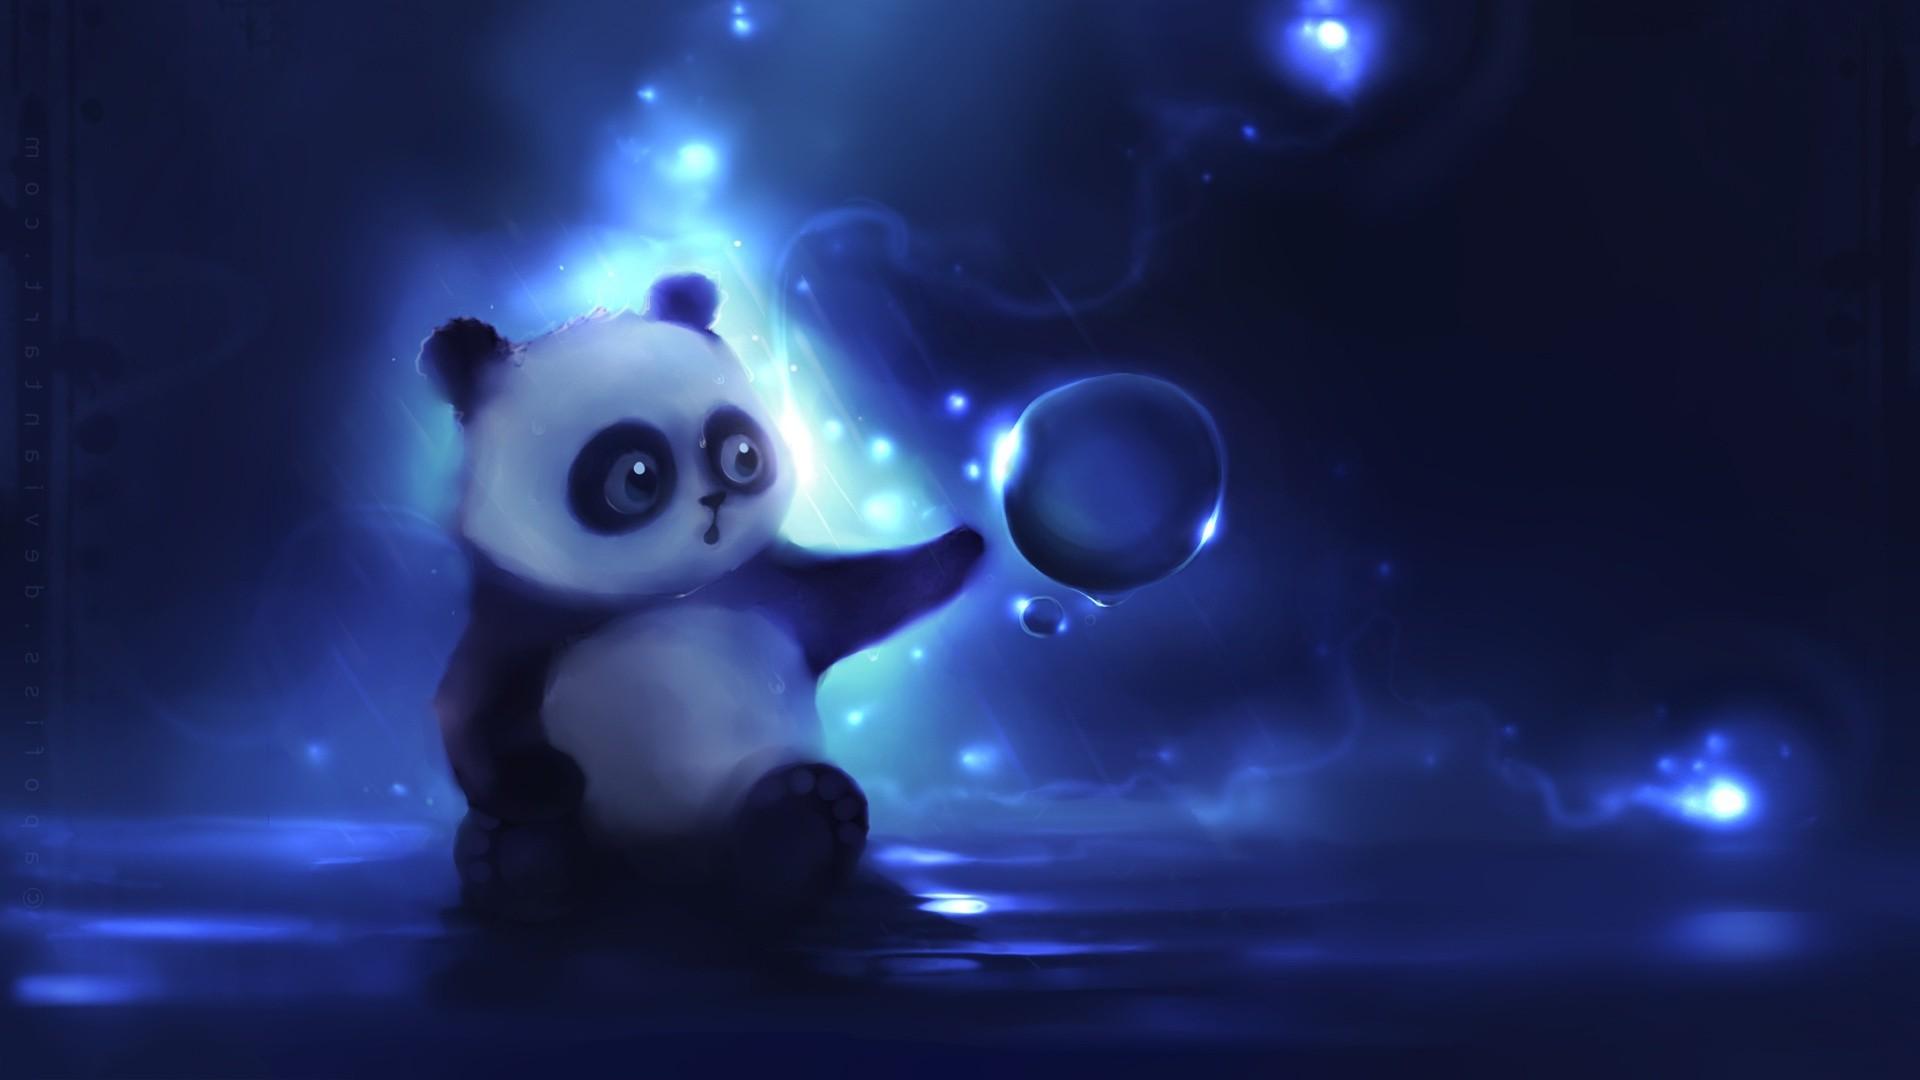 Res: 1920x1080, Anime Panda Background Wallpaper 07549